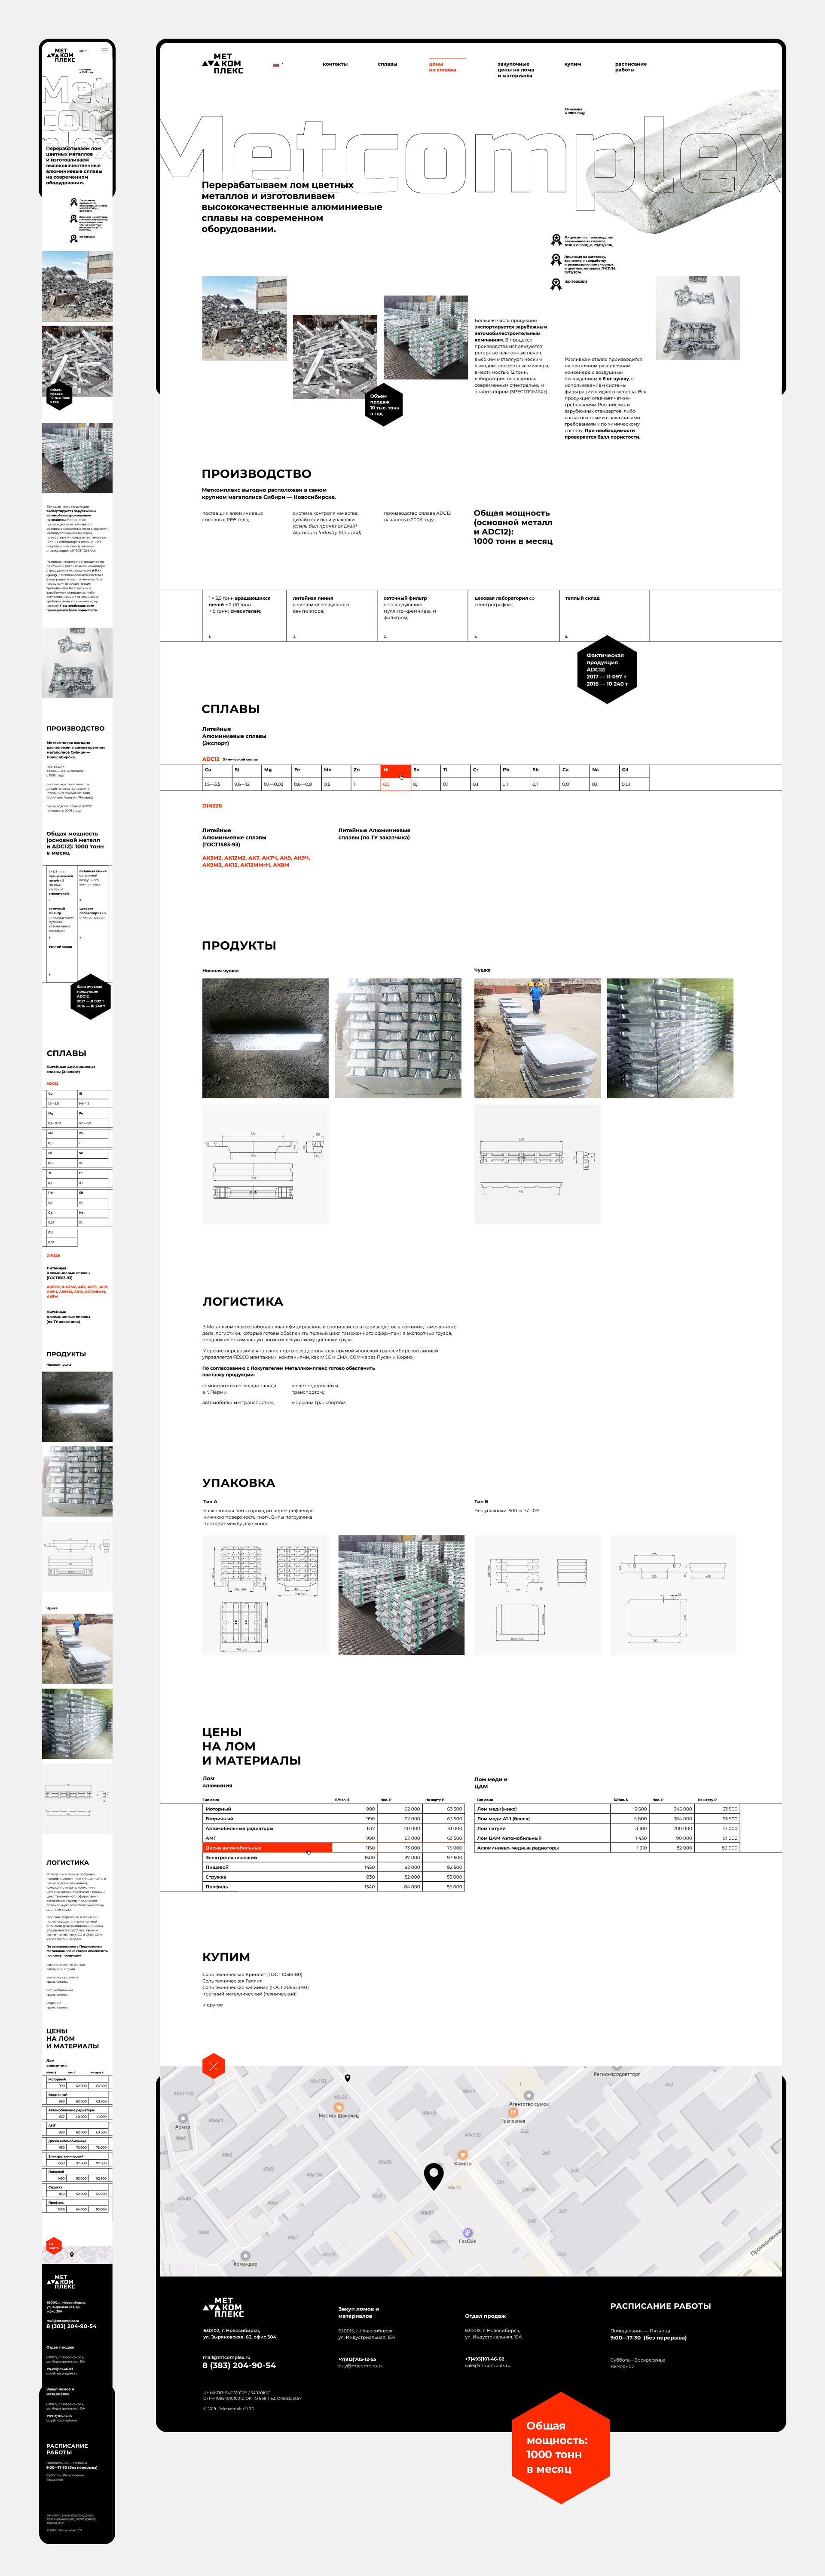 prev_site_metc_62